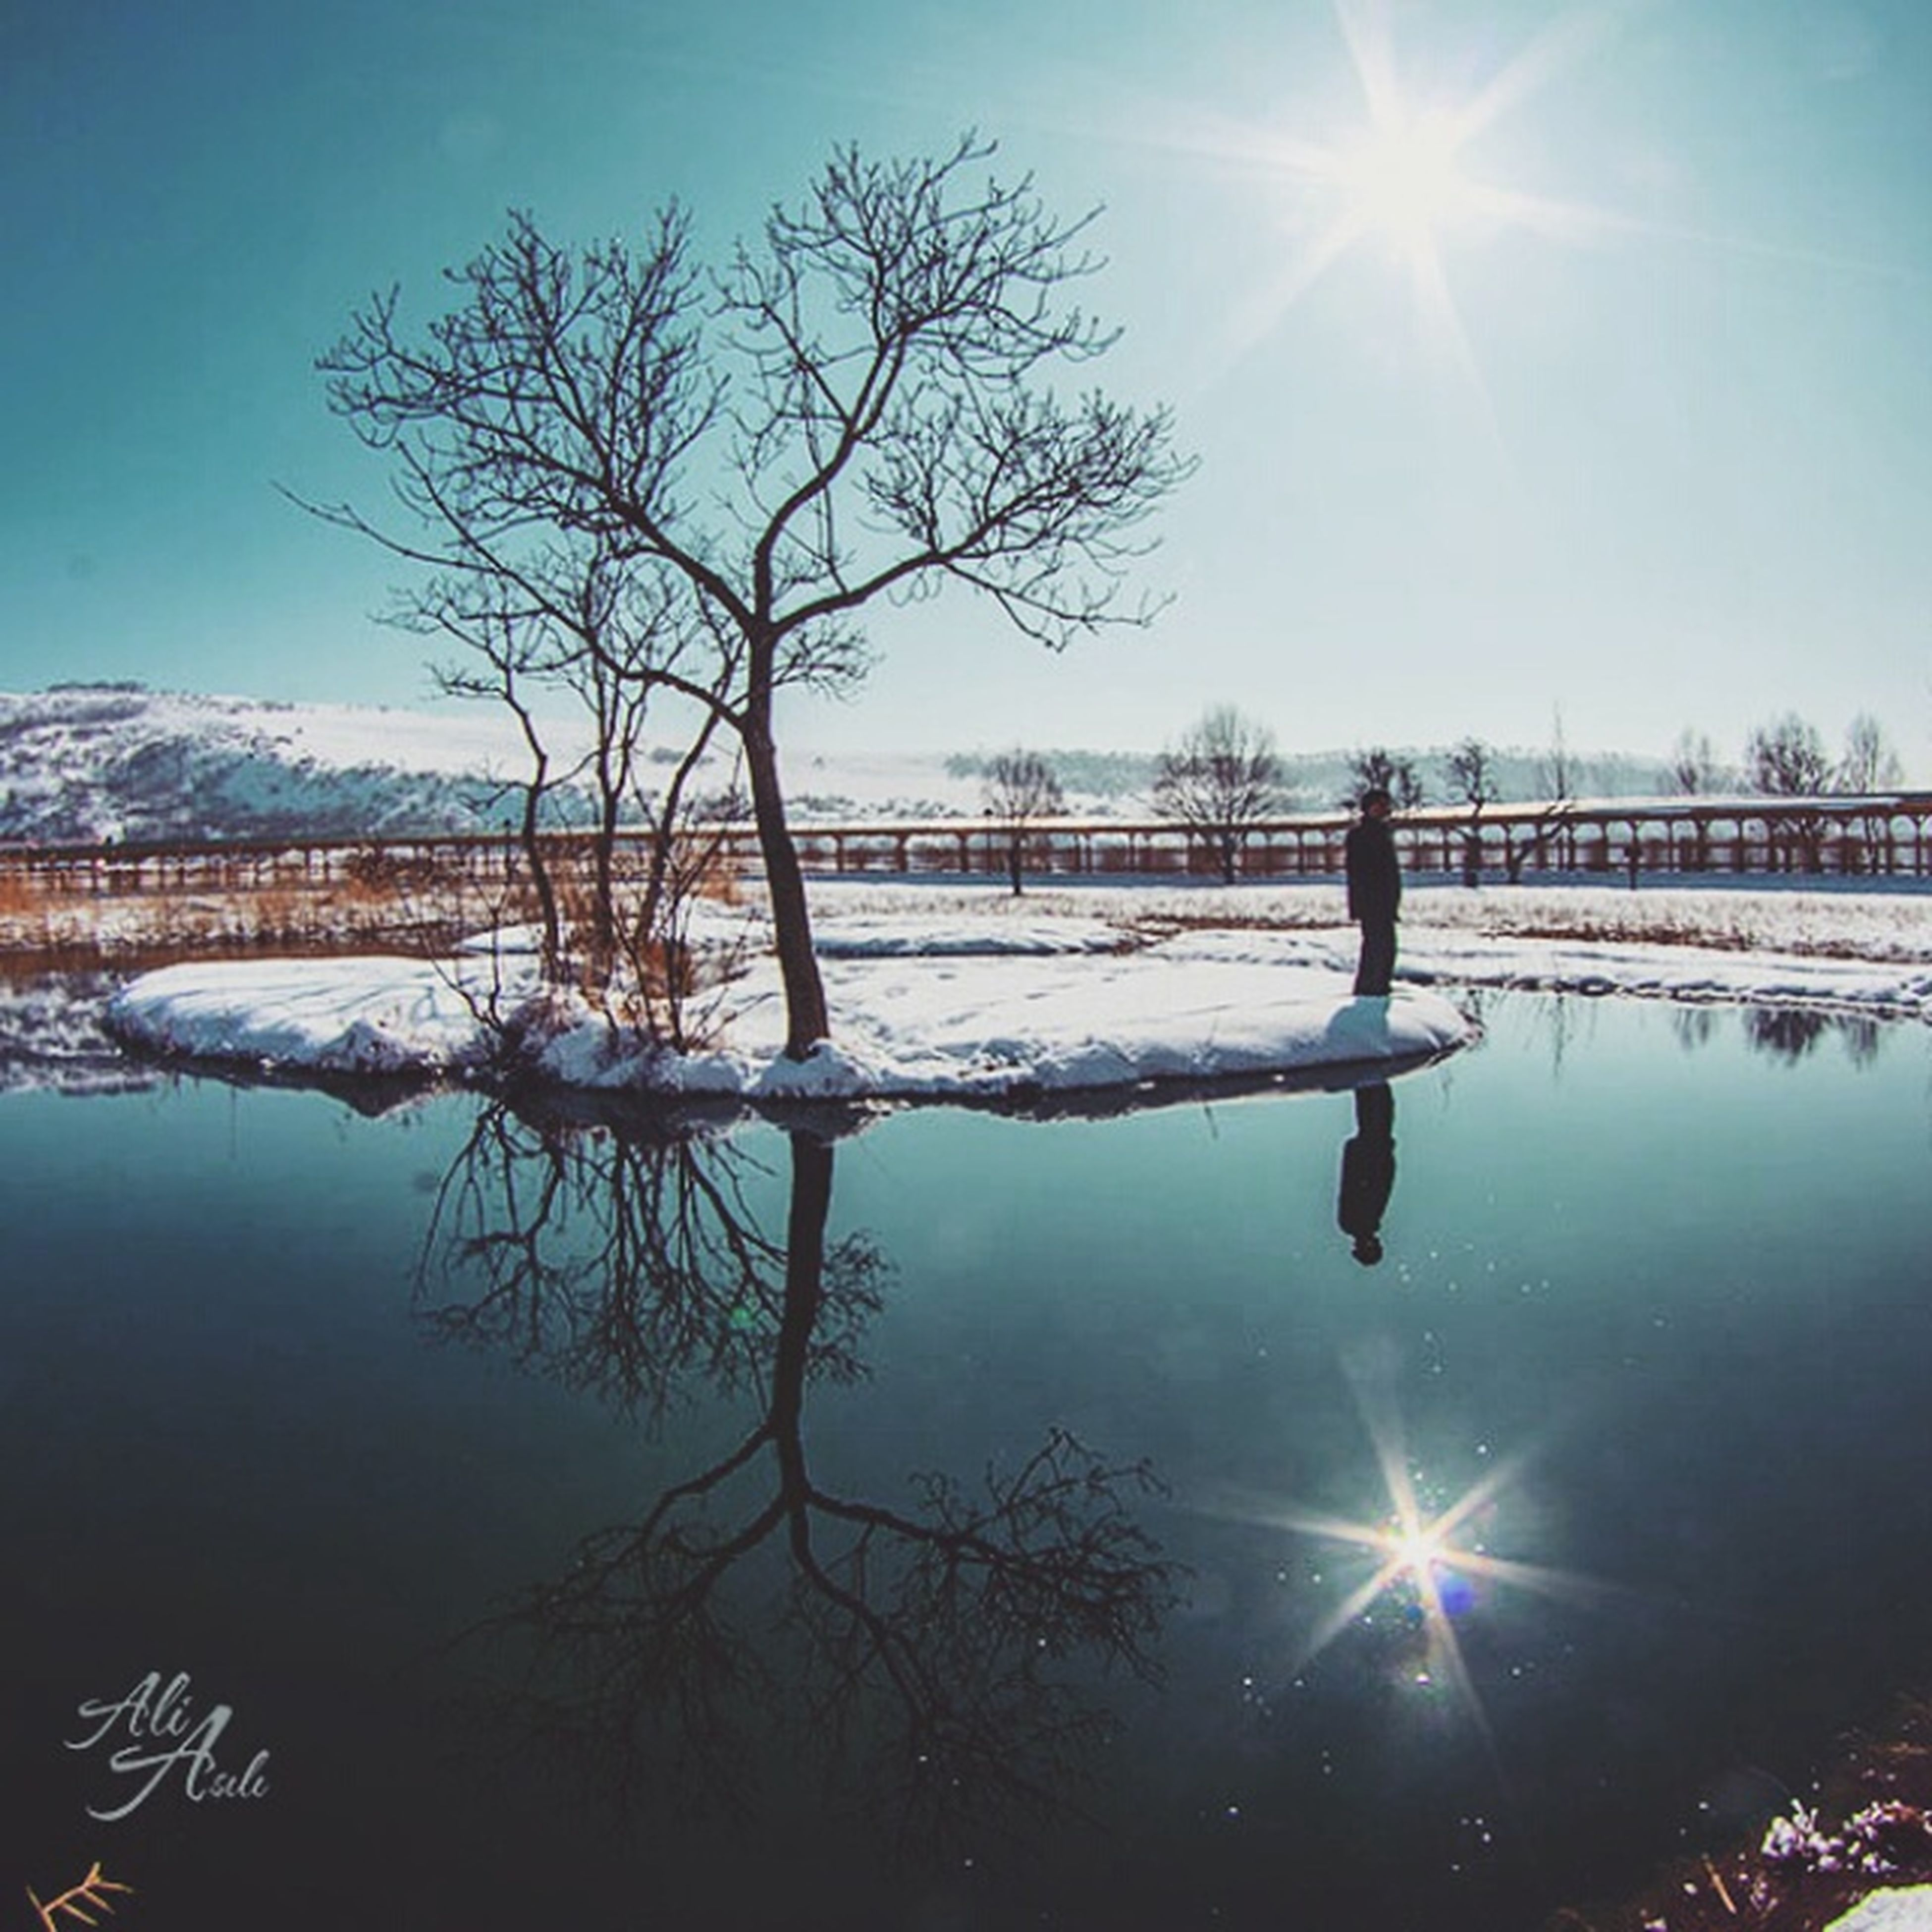 Good morning - Günaydın. ☕ ☺ ? Floating Islands , Yüzen Adalar, Bingöl. Bingöl Yüzenadalar Floatingislands Popular Photos EyeEm Best Shots - Landscape Winter Cold Day Reflection Lake Taking Photos